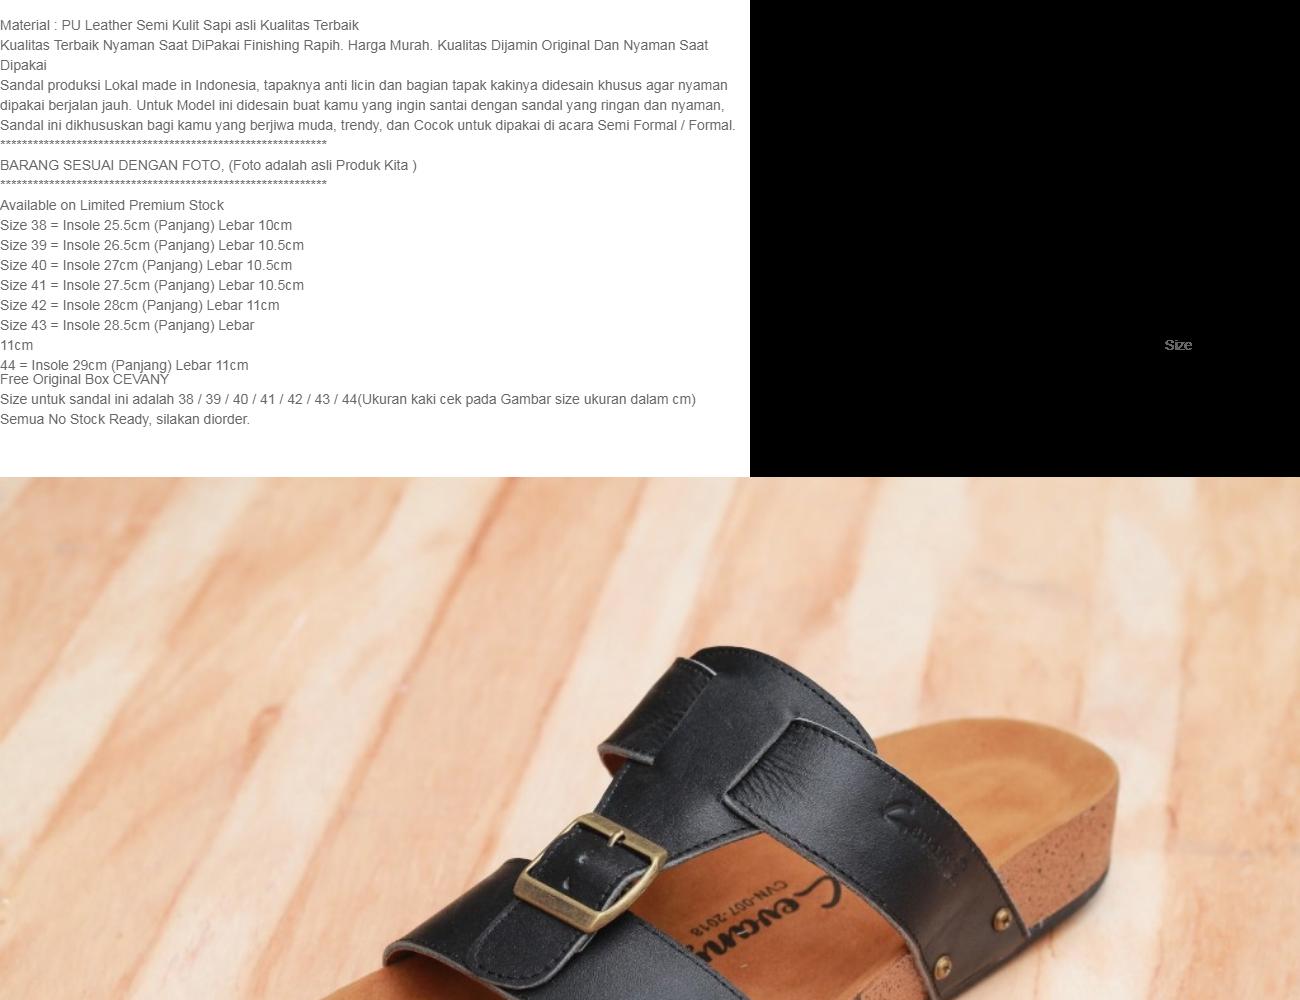 Harga New Sandal Pria Kulit Asli Casual Modis Remaja Warna Hitam Sendal Kasual Gaul Cevany Lucky Lelaki Leather Cowok Original